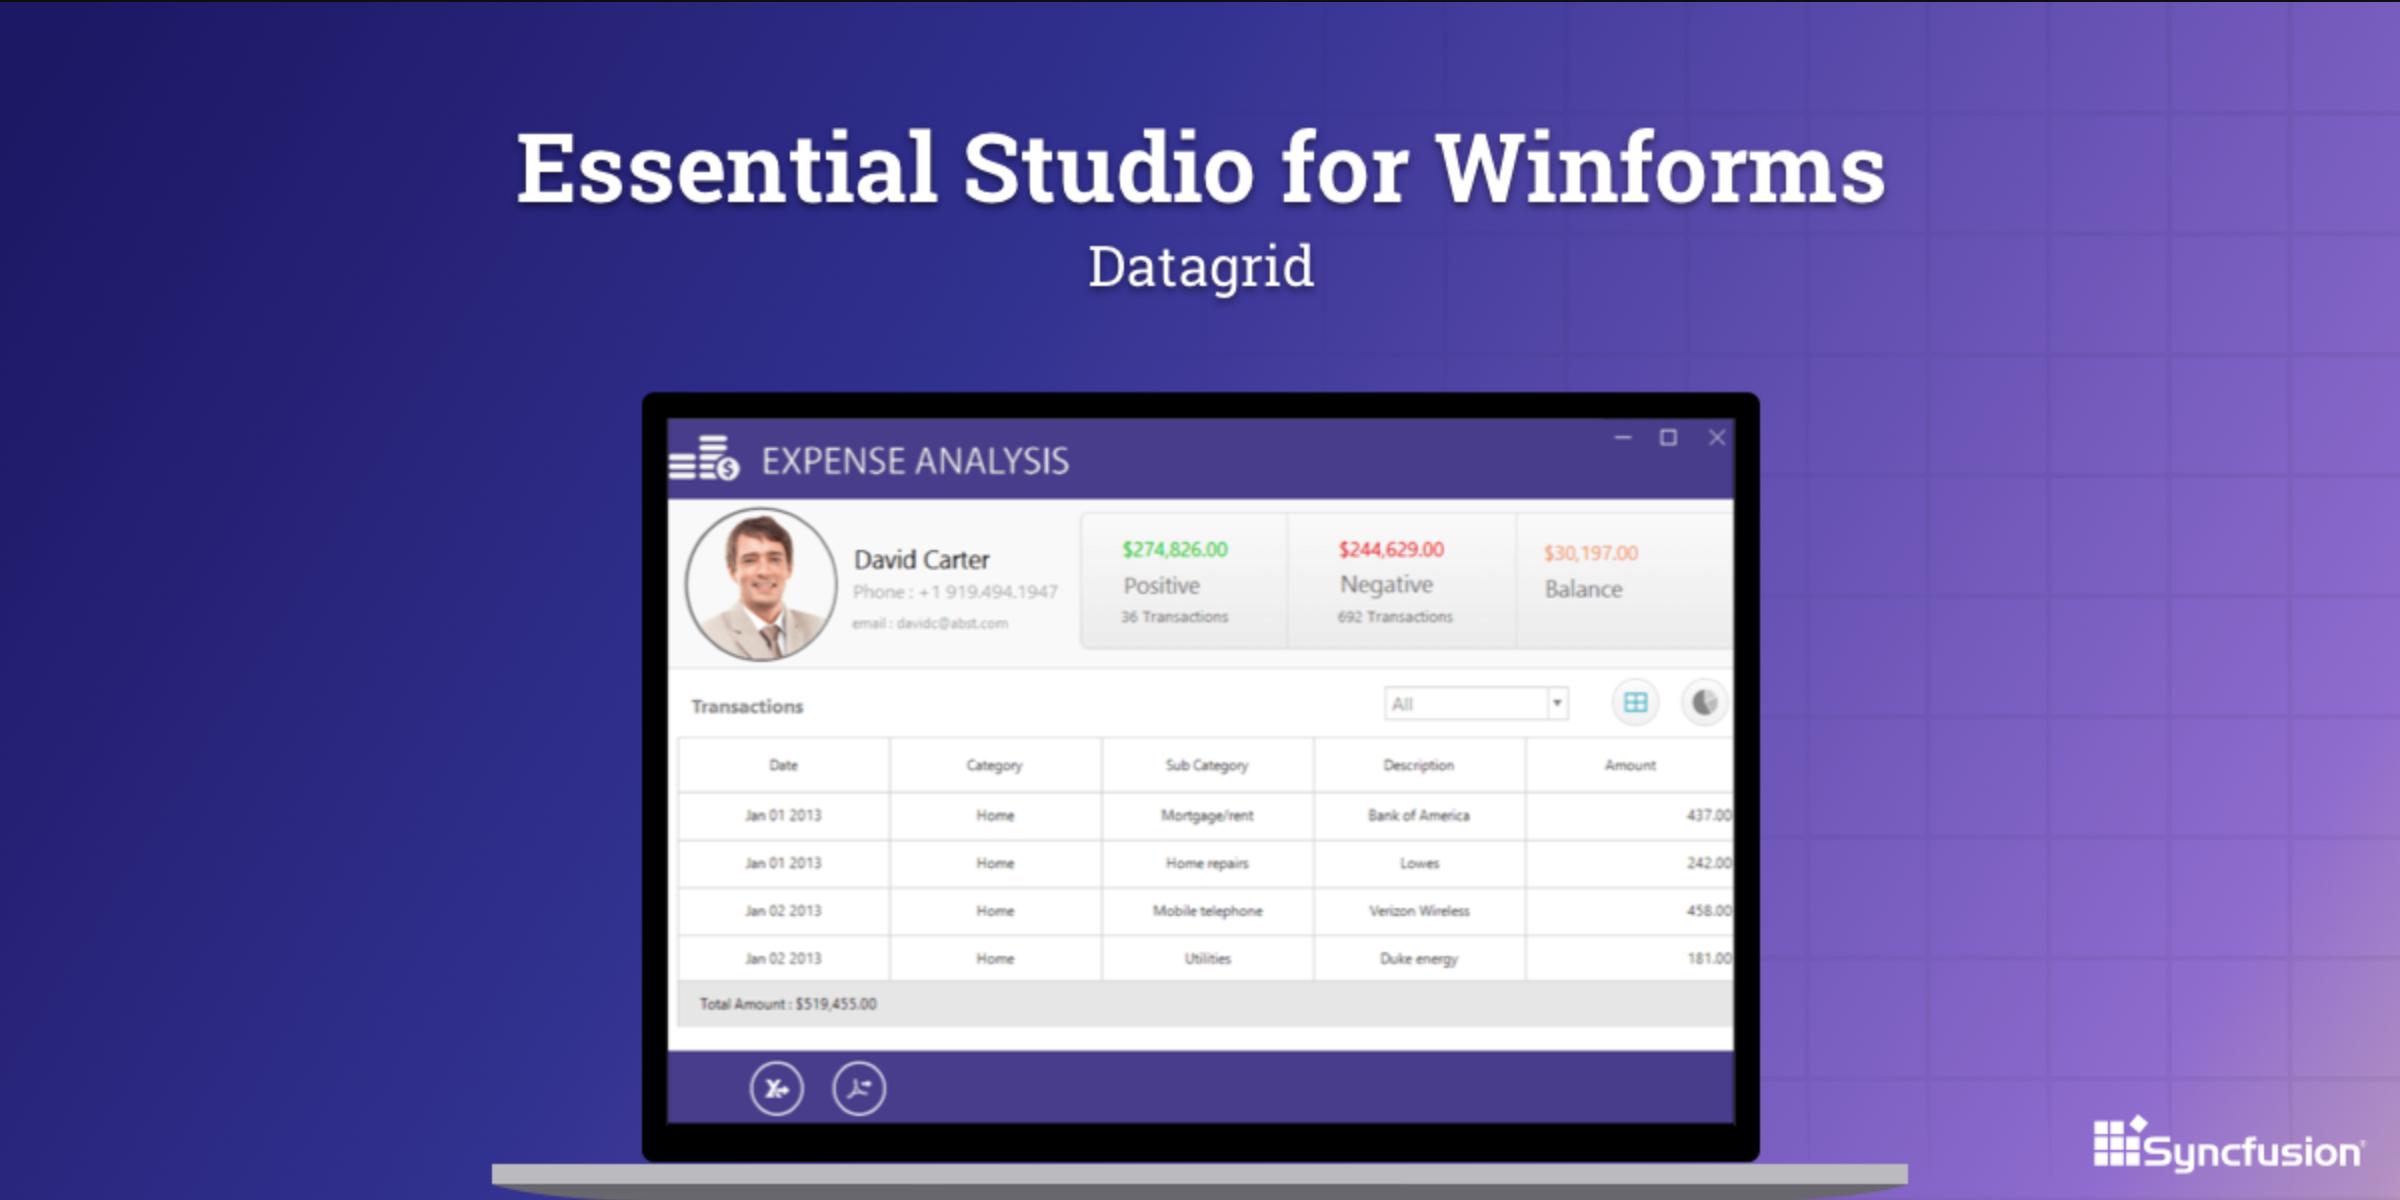 Essential Studio for Winforms